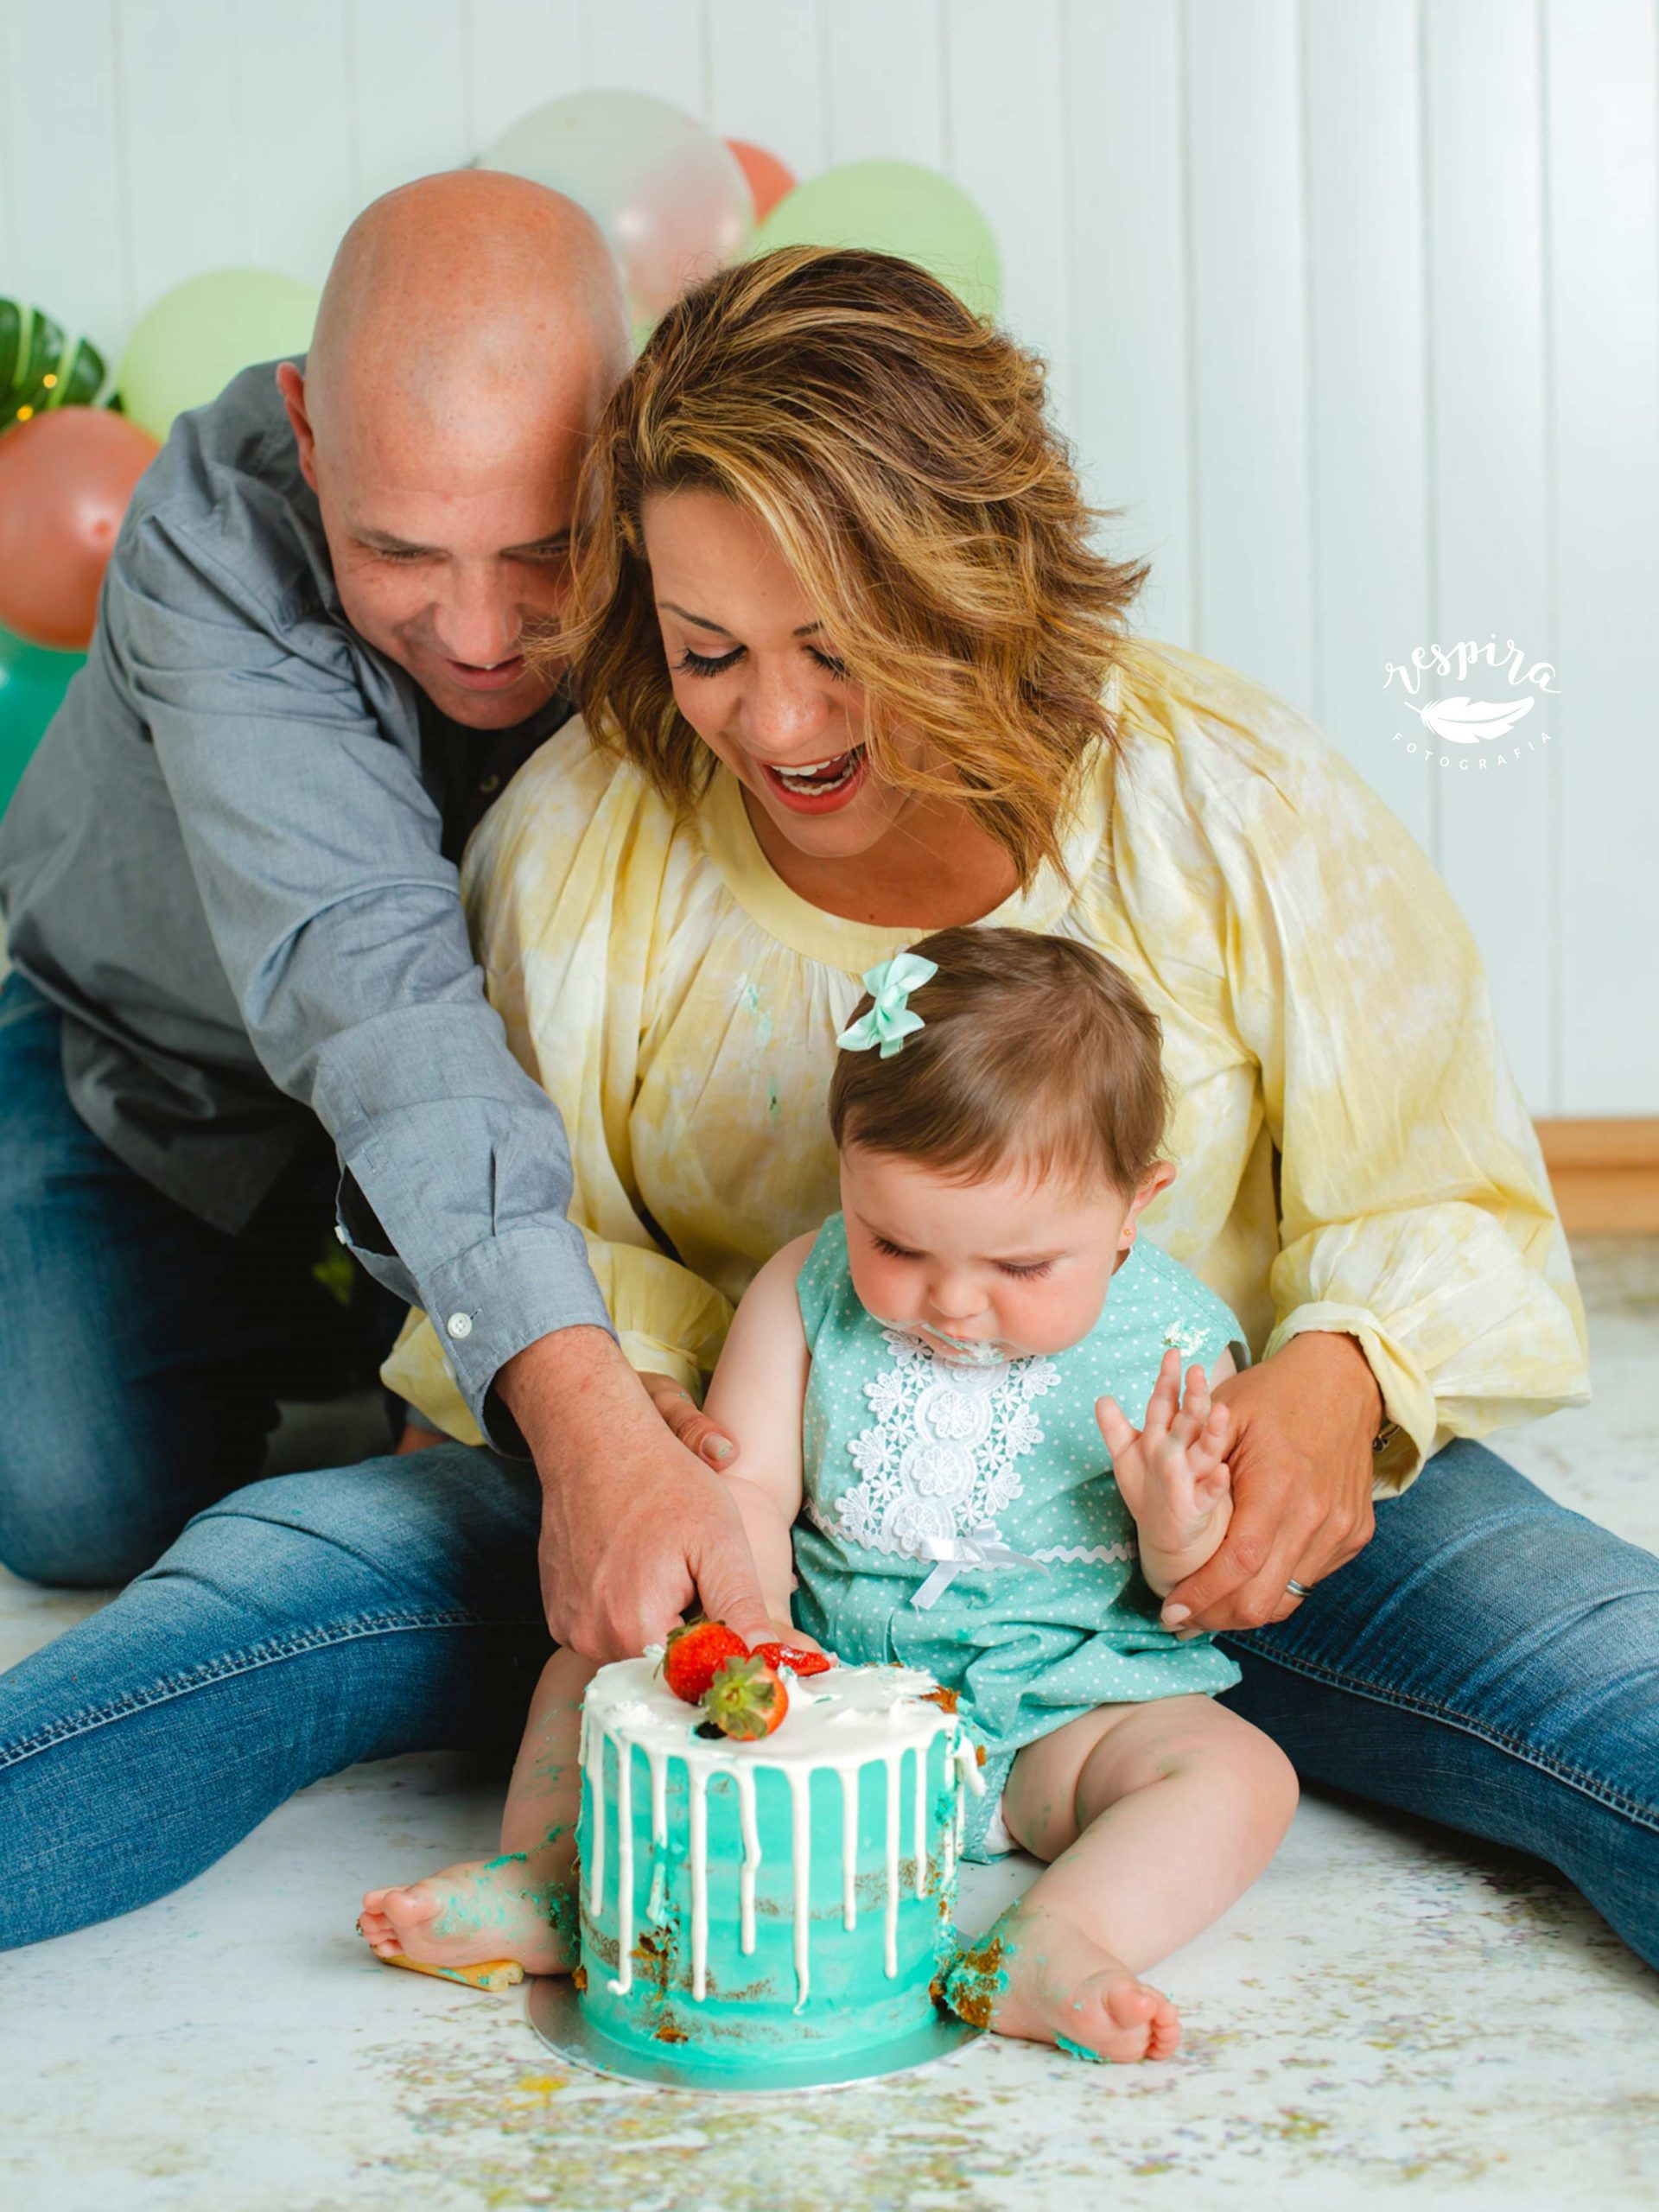 Smash cake olesa abrera martorell